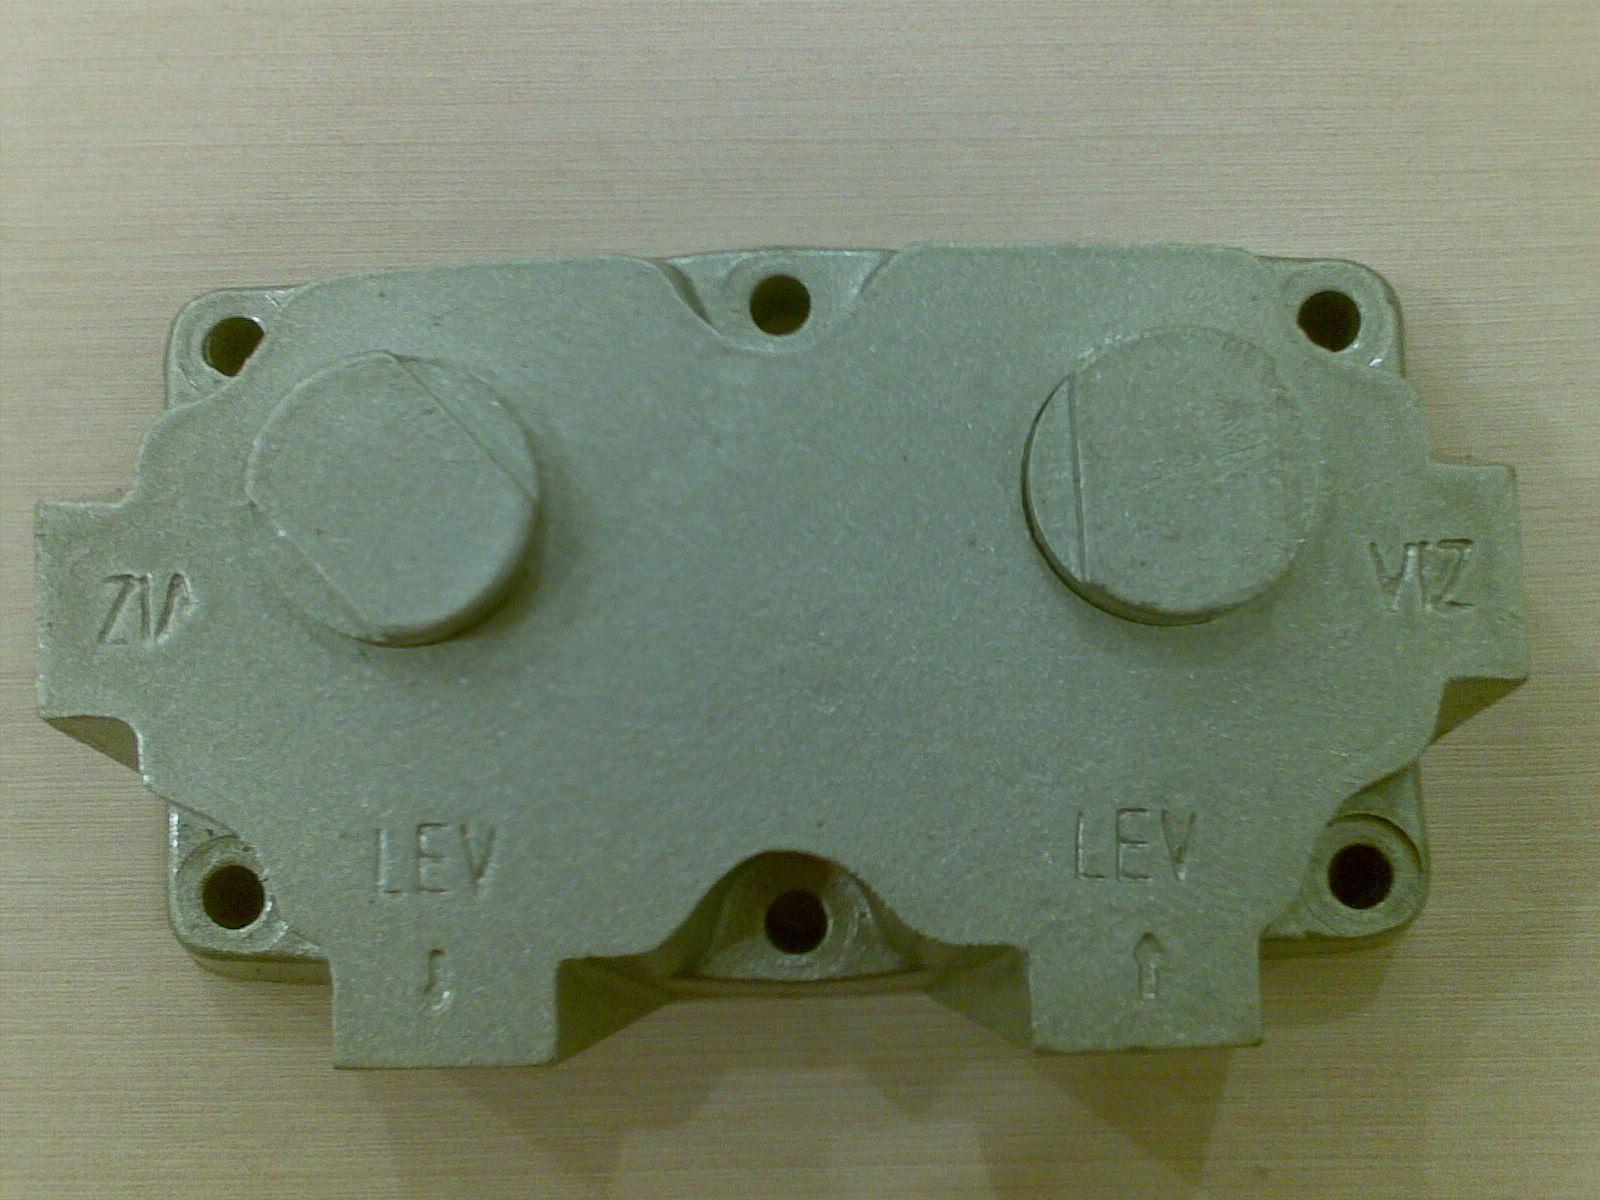 Запчасти на компрессор Ikarus (Икарус) 250, 255, 256, 259, 260, 280, 283